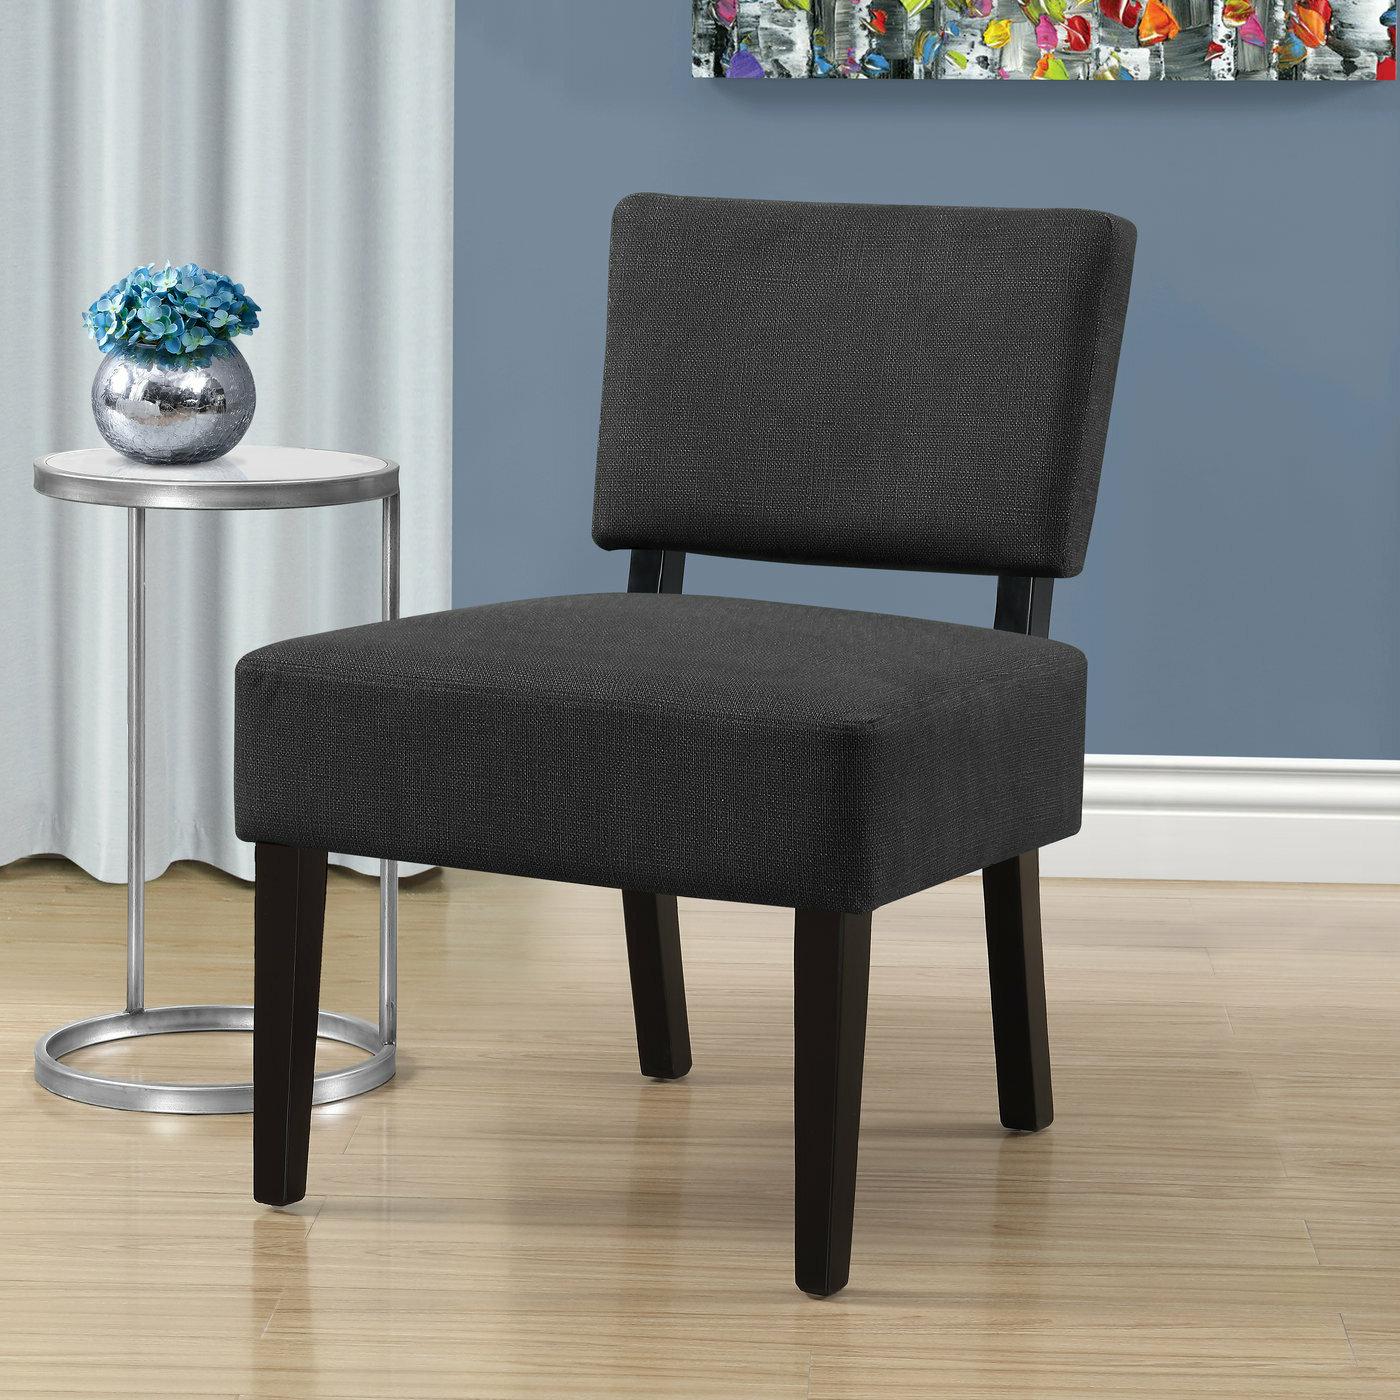 Ileana Slipper Chair Regarding Most Popular Wadhurst Slipper Chairs (View 20 of 20)